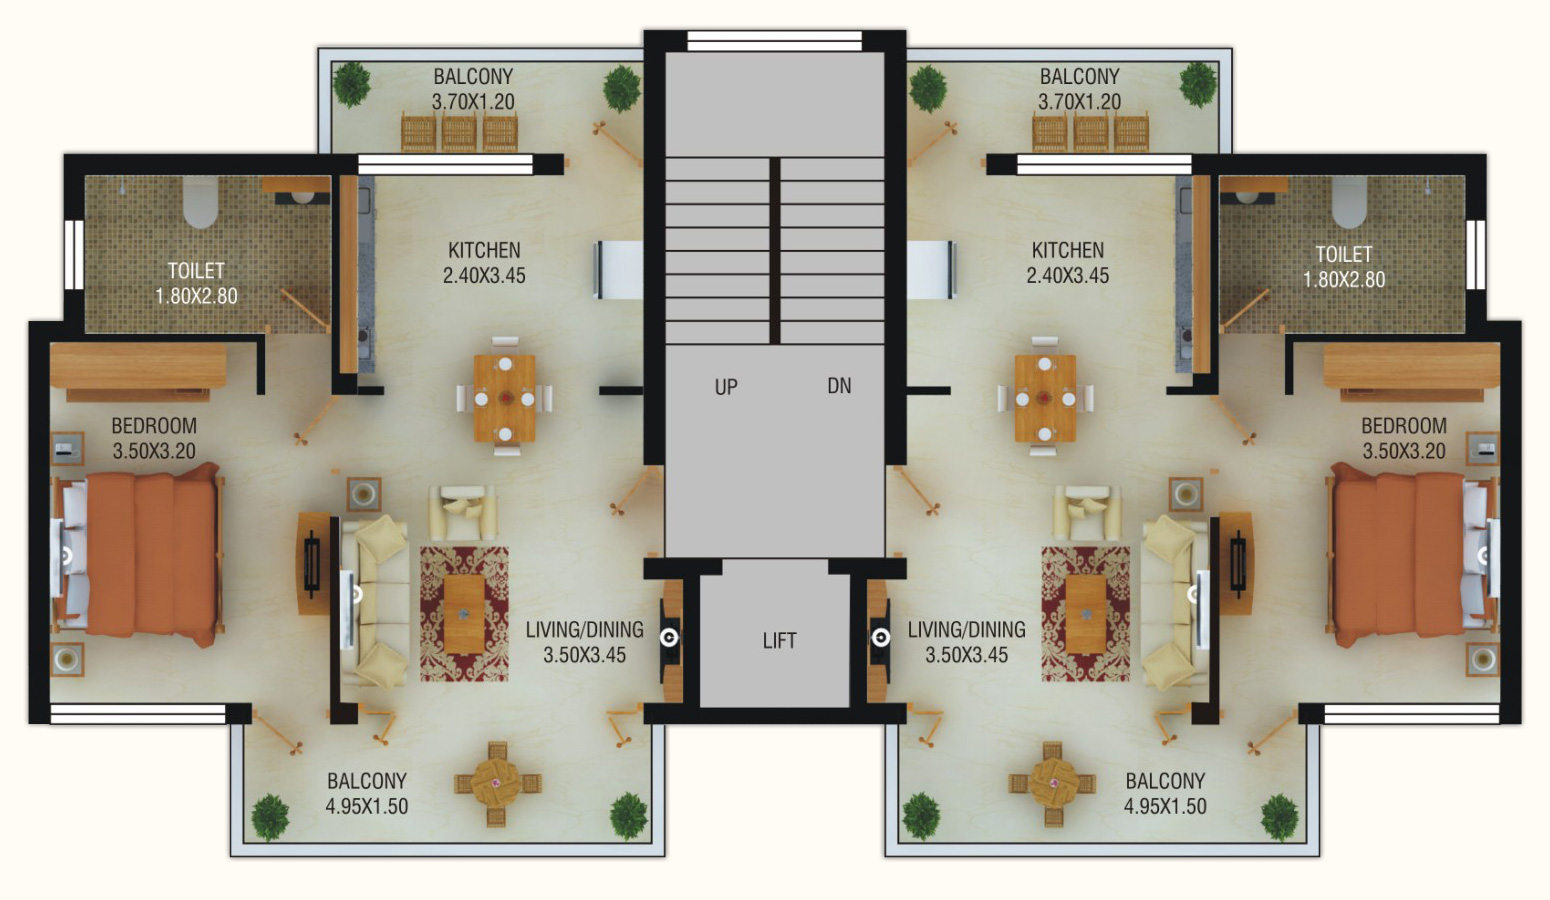 Typical Bedroom Size Beach Apartments Goa Floorplans World Class Apartments